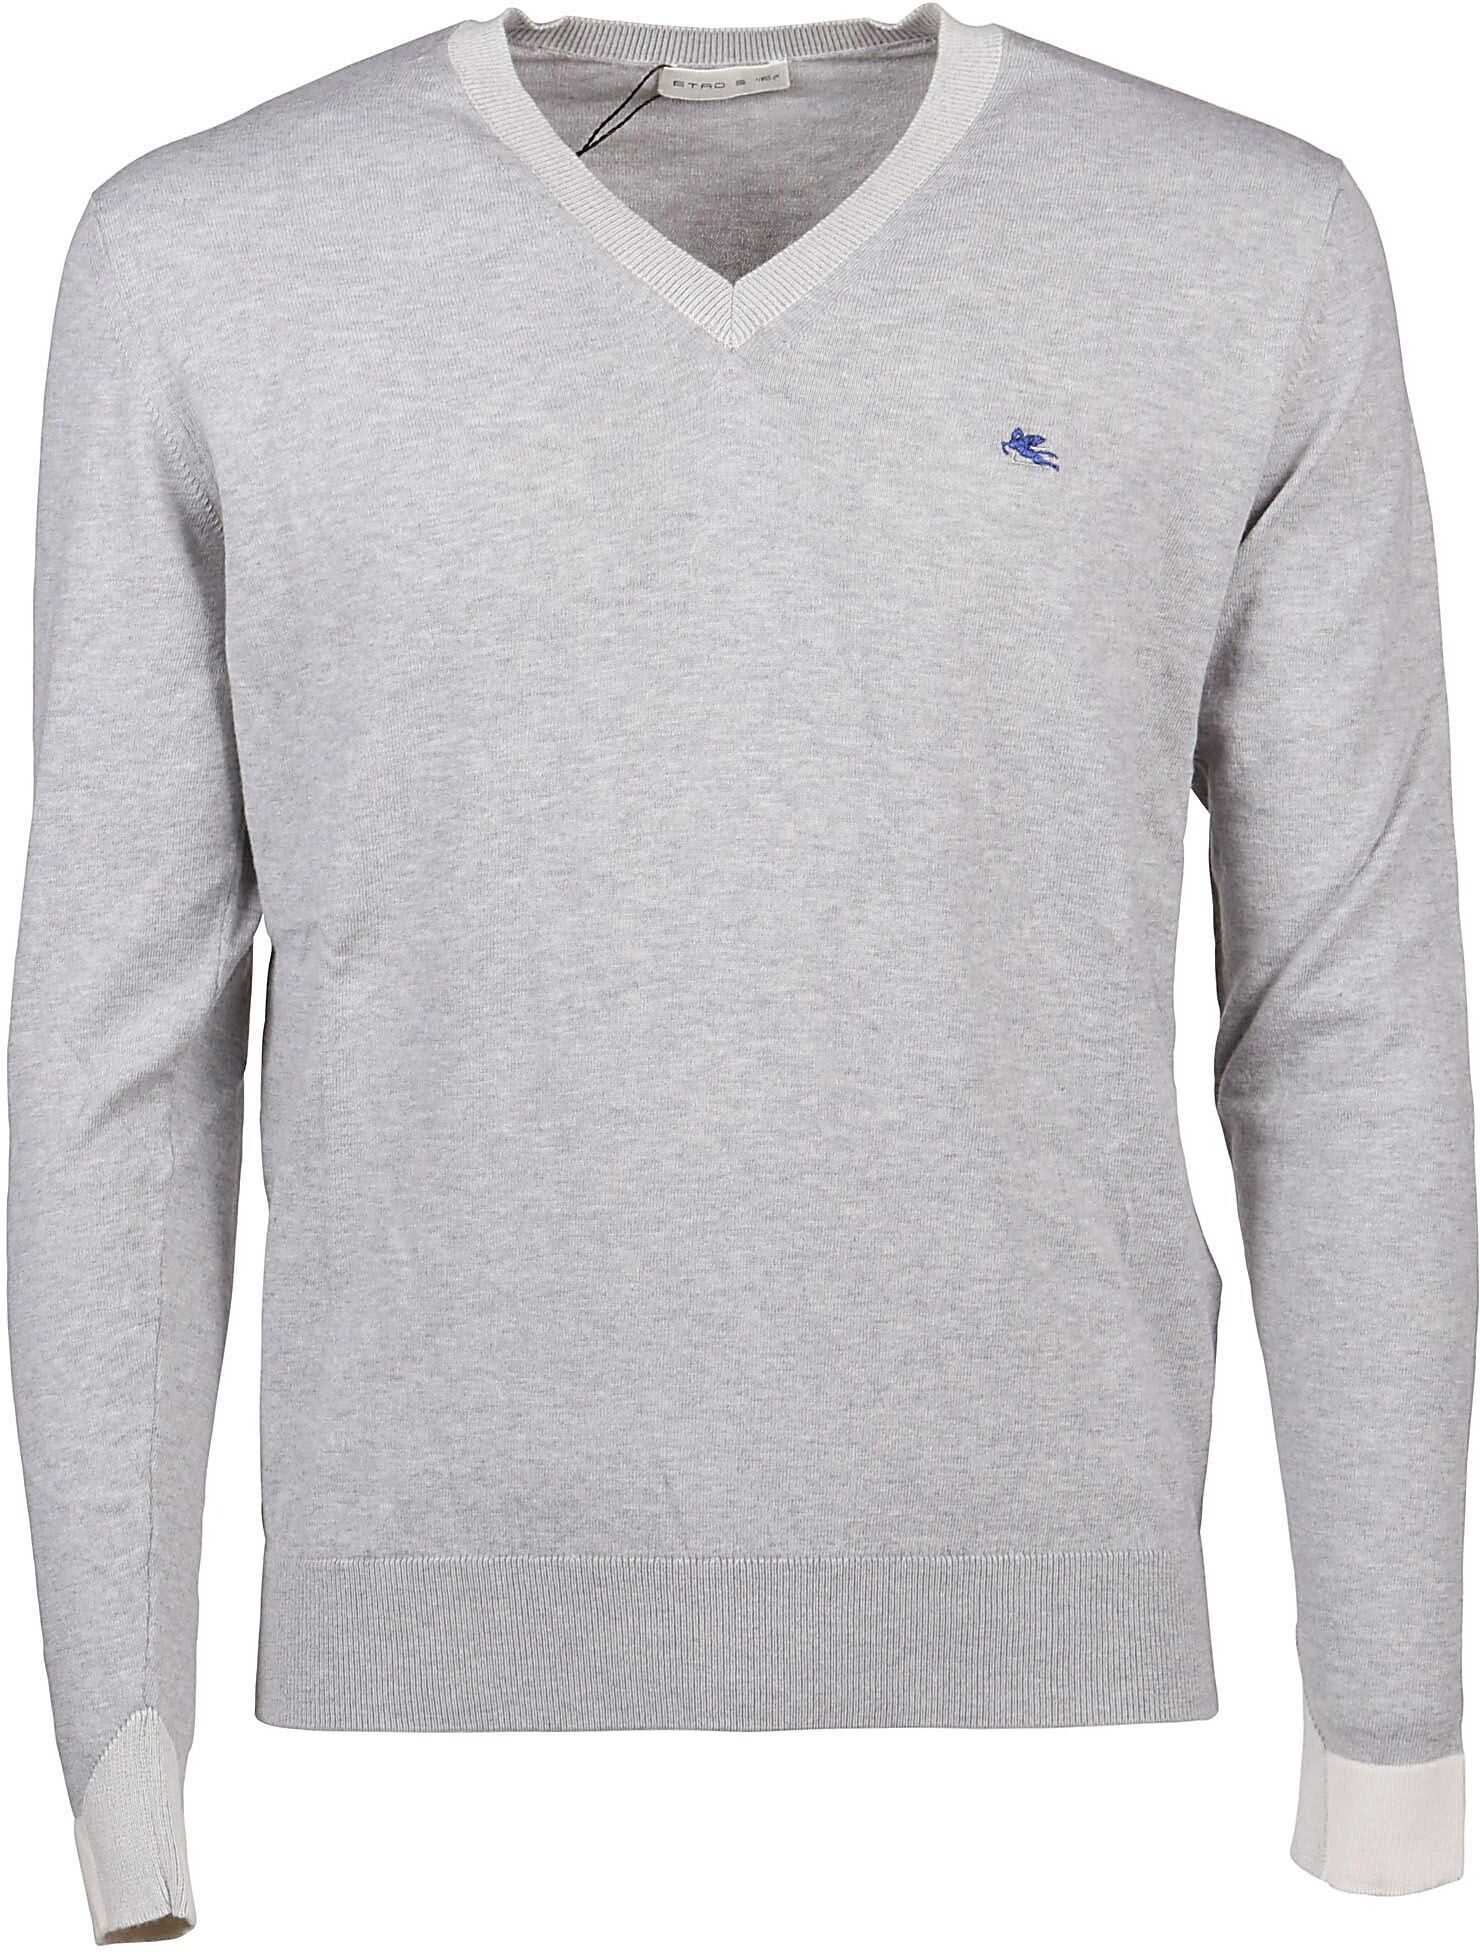 ETRO Cotton Sweater GREY